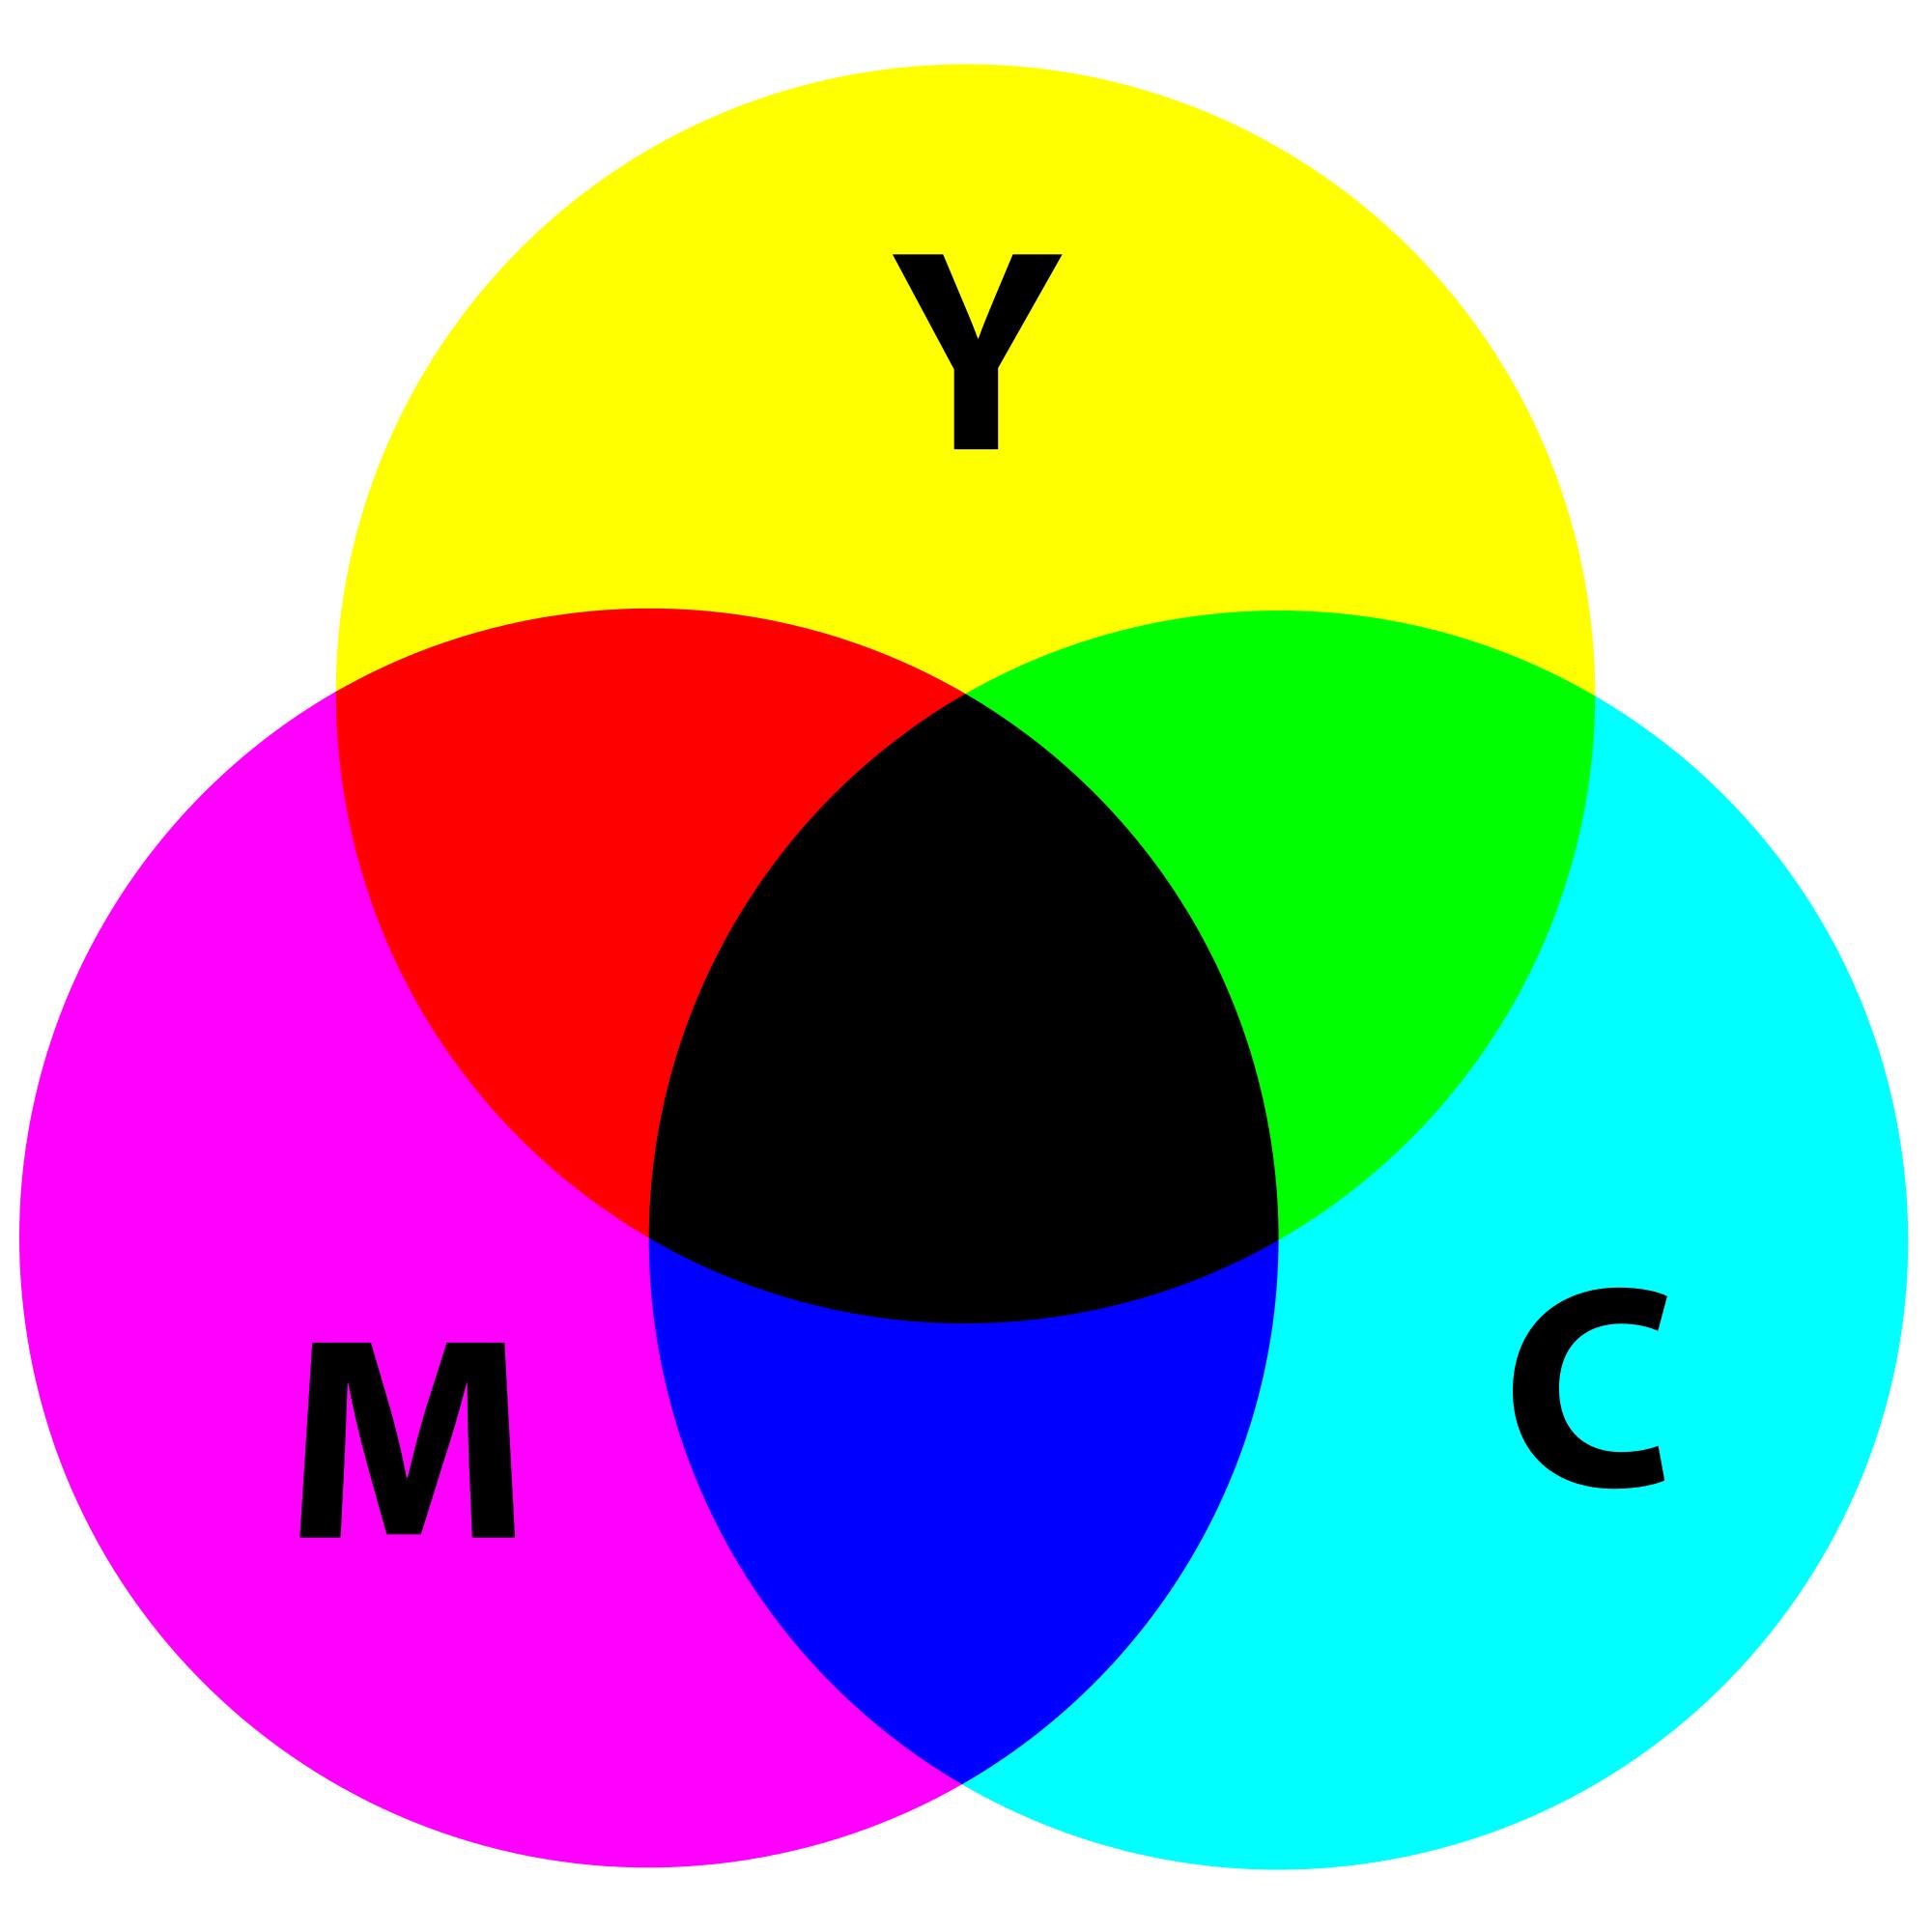 color theory wikipedia the free encyclopedia tarot studies